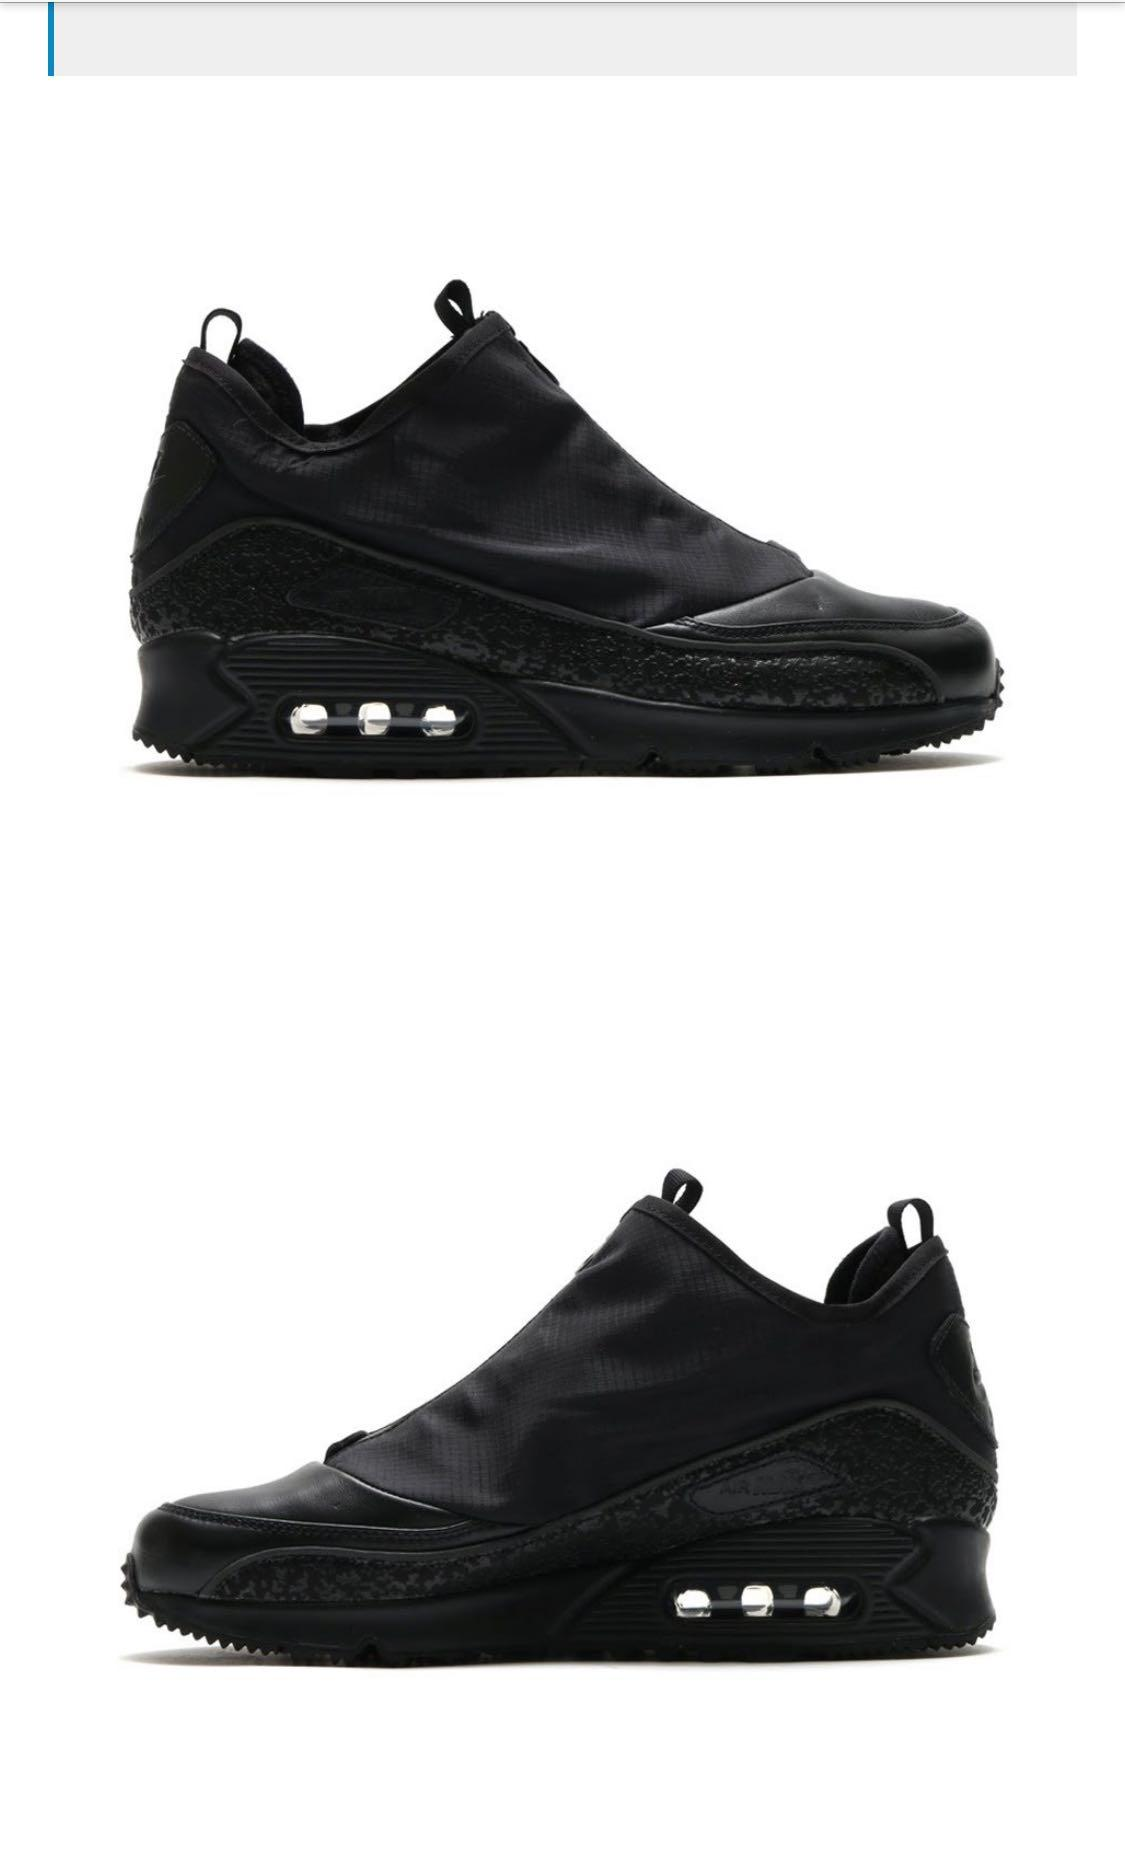 "Details about Men's Nike Air Max 90 Ultra BR ""Triple Black"" Size UK7 EU41 ••Bargain••"